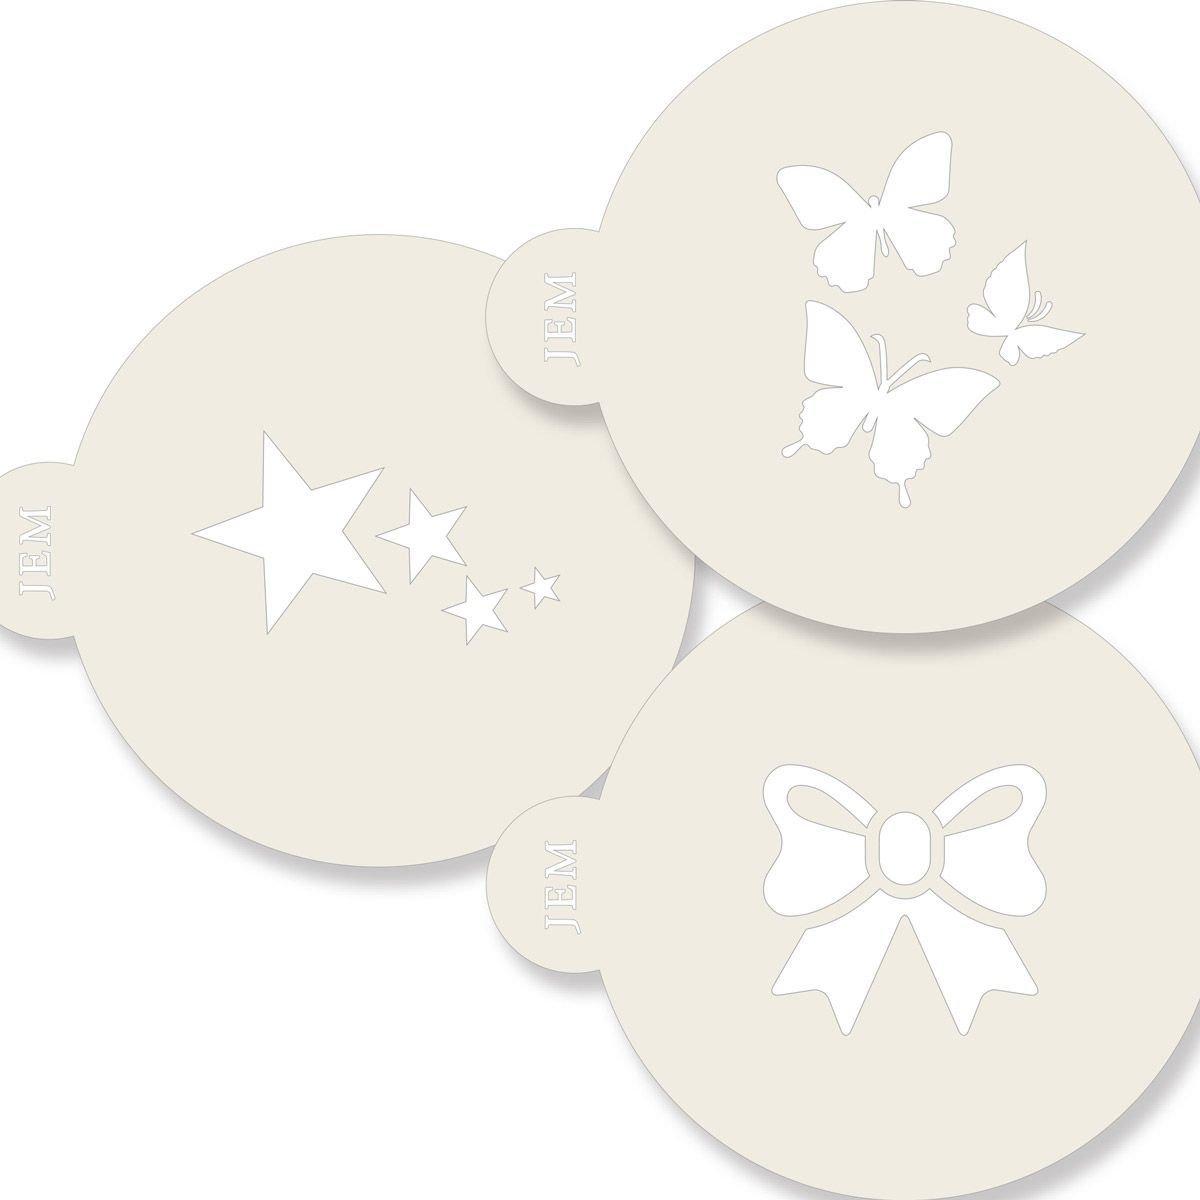 JEM Stencil -Set of 3 CLASSIC Designs -Butterflies, Star, & Ribbon -Στένσιλ Πεταλούδες Αστέρι Κορδέλα 3 τεμ